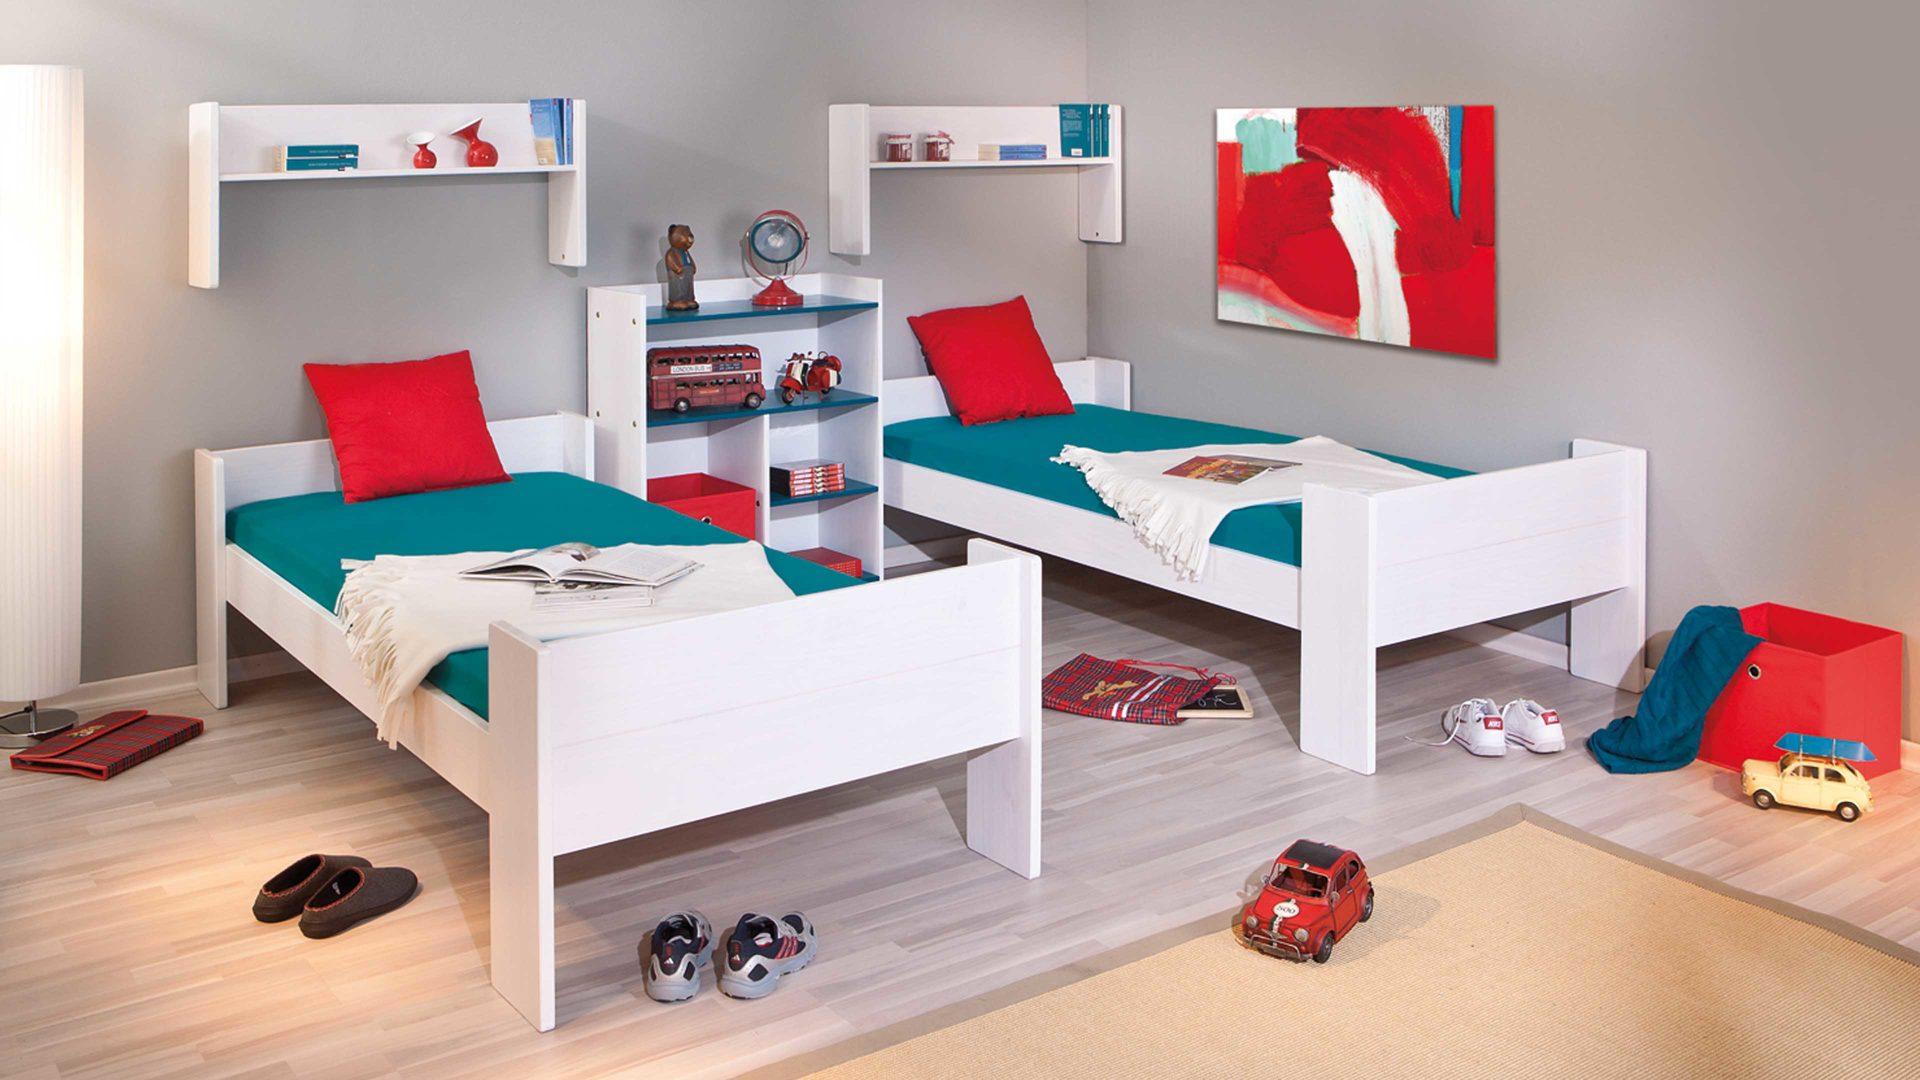 Hertel Mobel E K Gesees Raume Jugendzimmer Kinderzimmer Betten